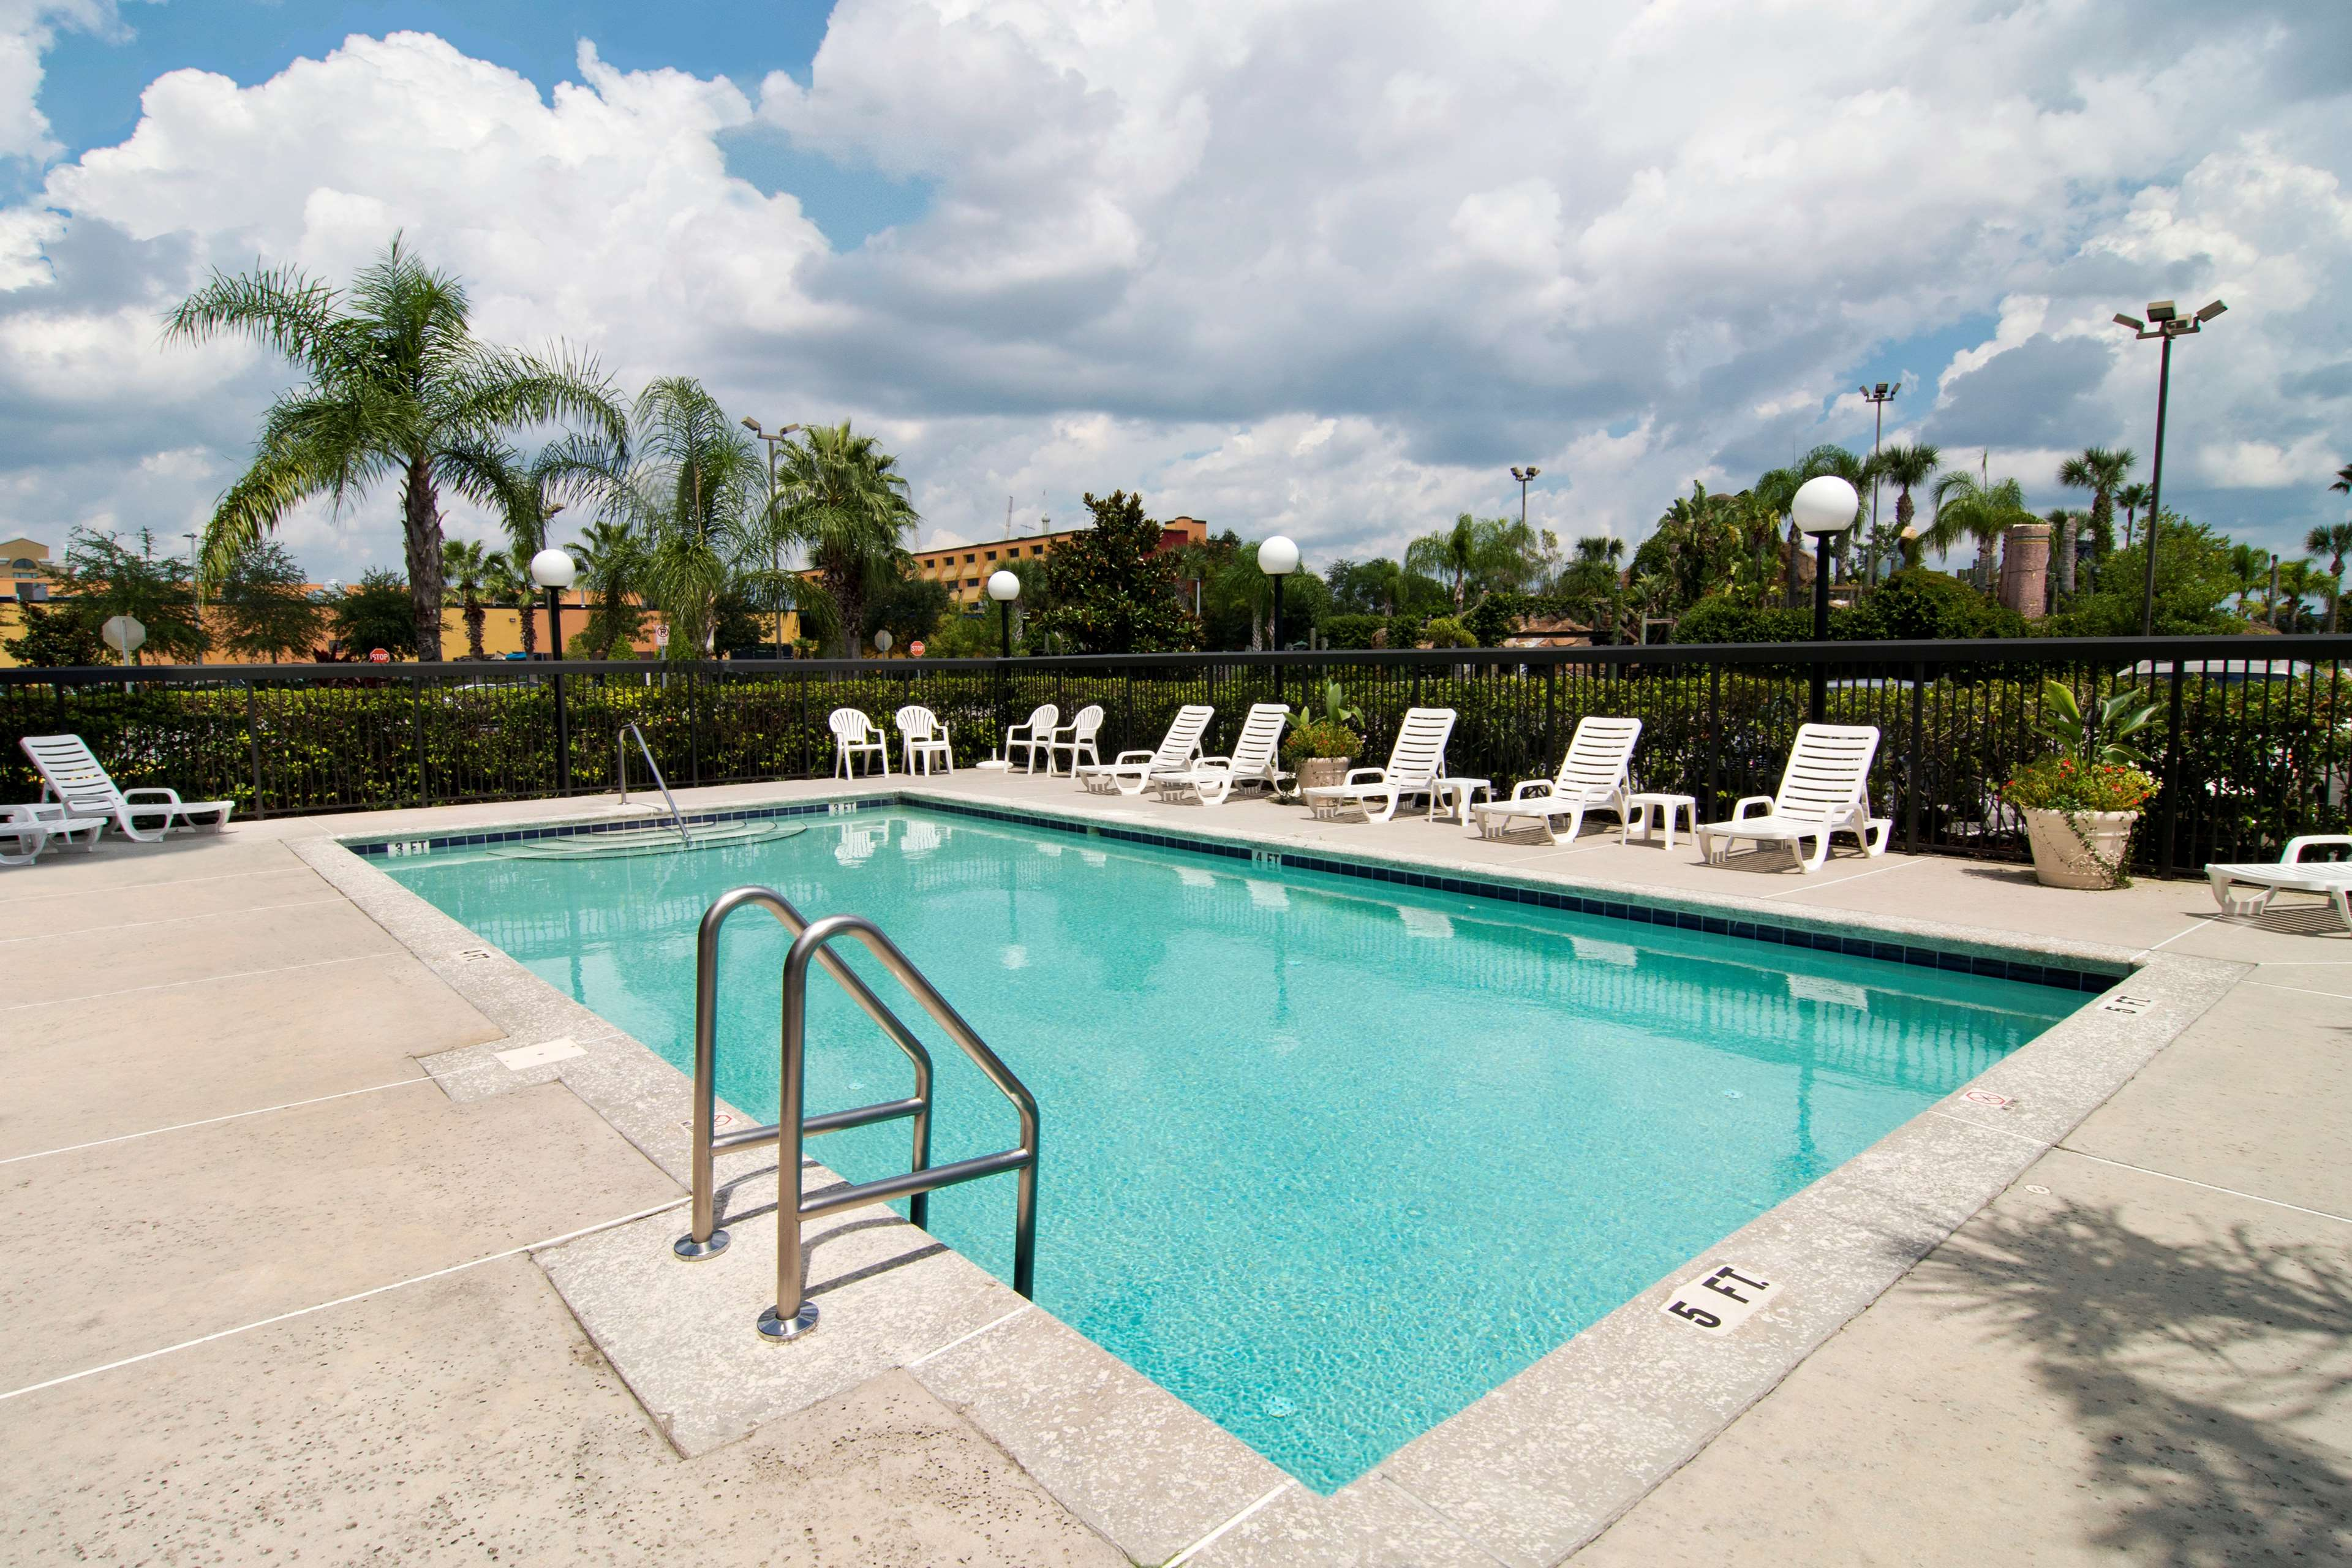 Hampton Inn & Suites Orlando Intl Dr N image 4